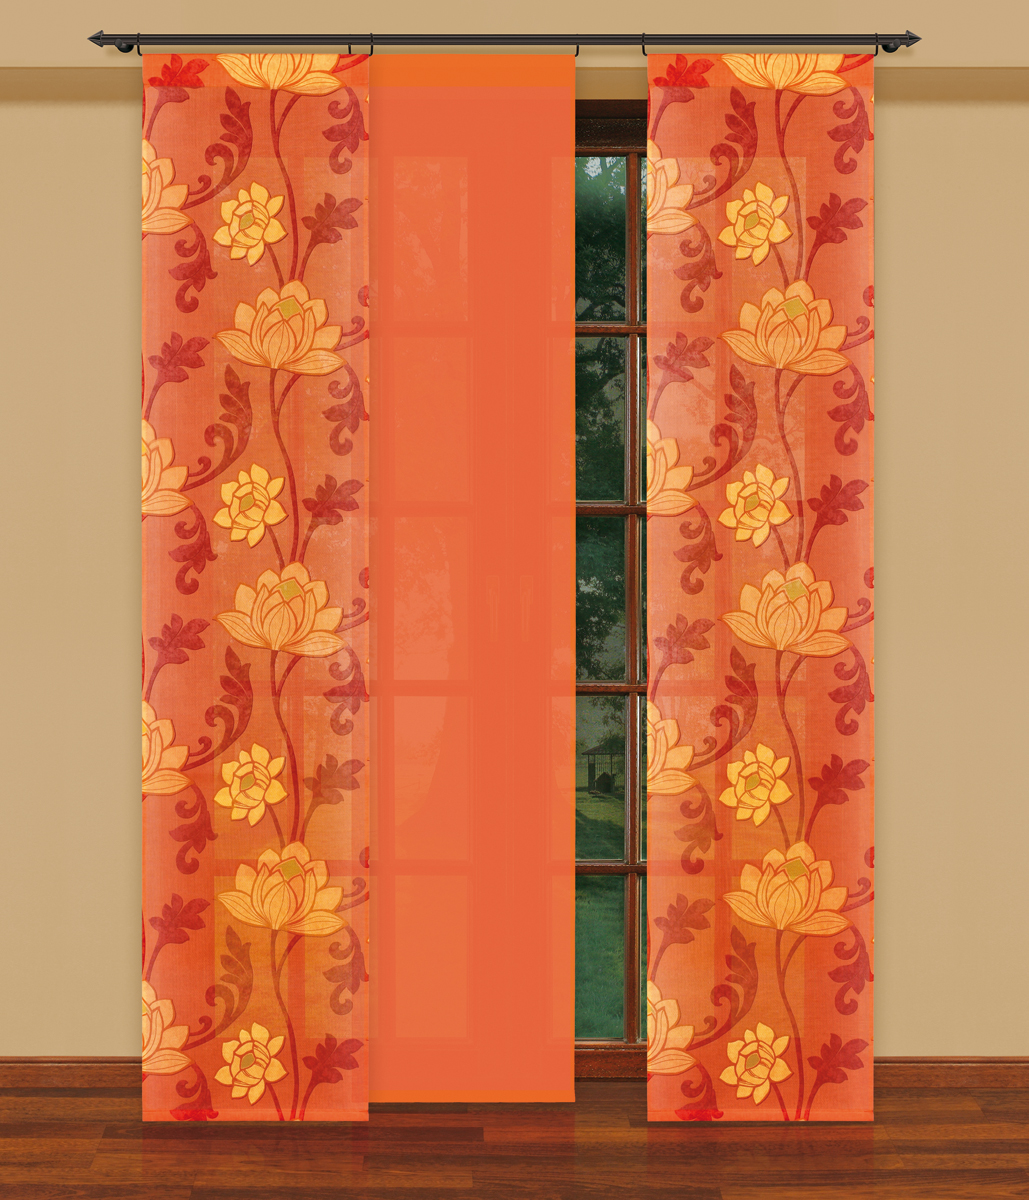 Гардина HAFT 250*50*3. 202240/50 оранжевый202240/50 оранжевыйГардина XAFT 250*50*3. 202240/50 оранжевыйМатериал: 100% п/э, размер: 250*50*3, цвет: оранжевый